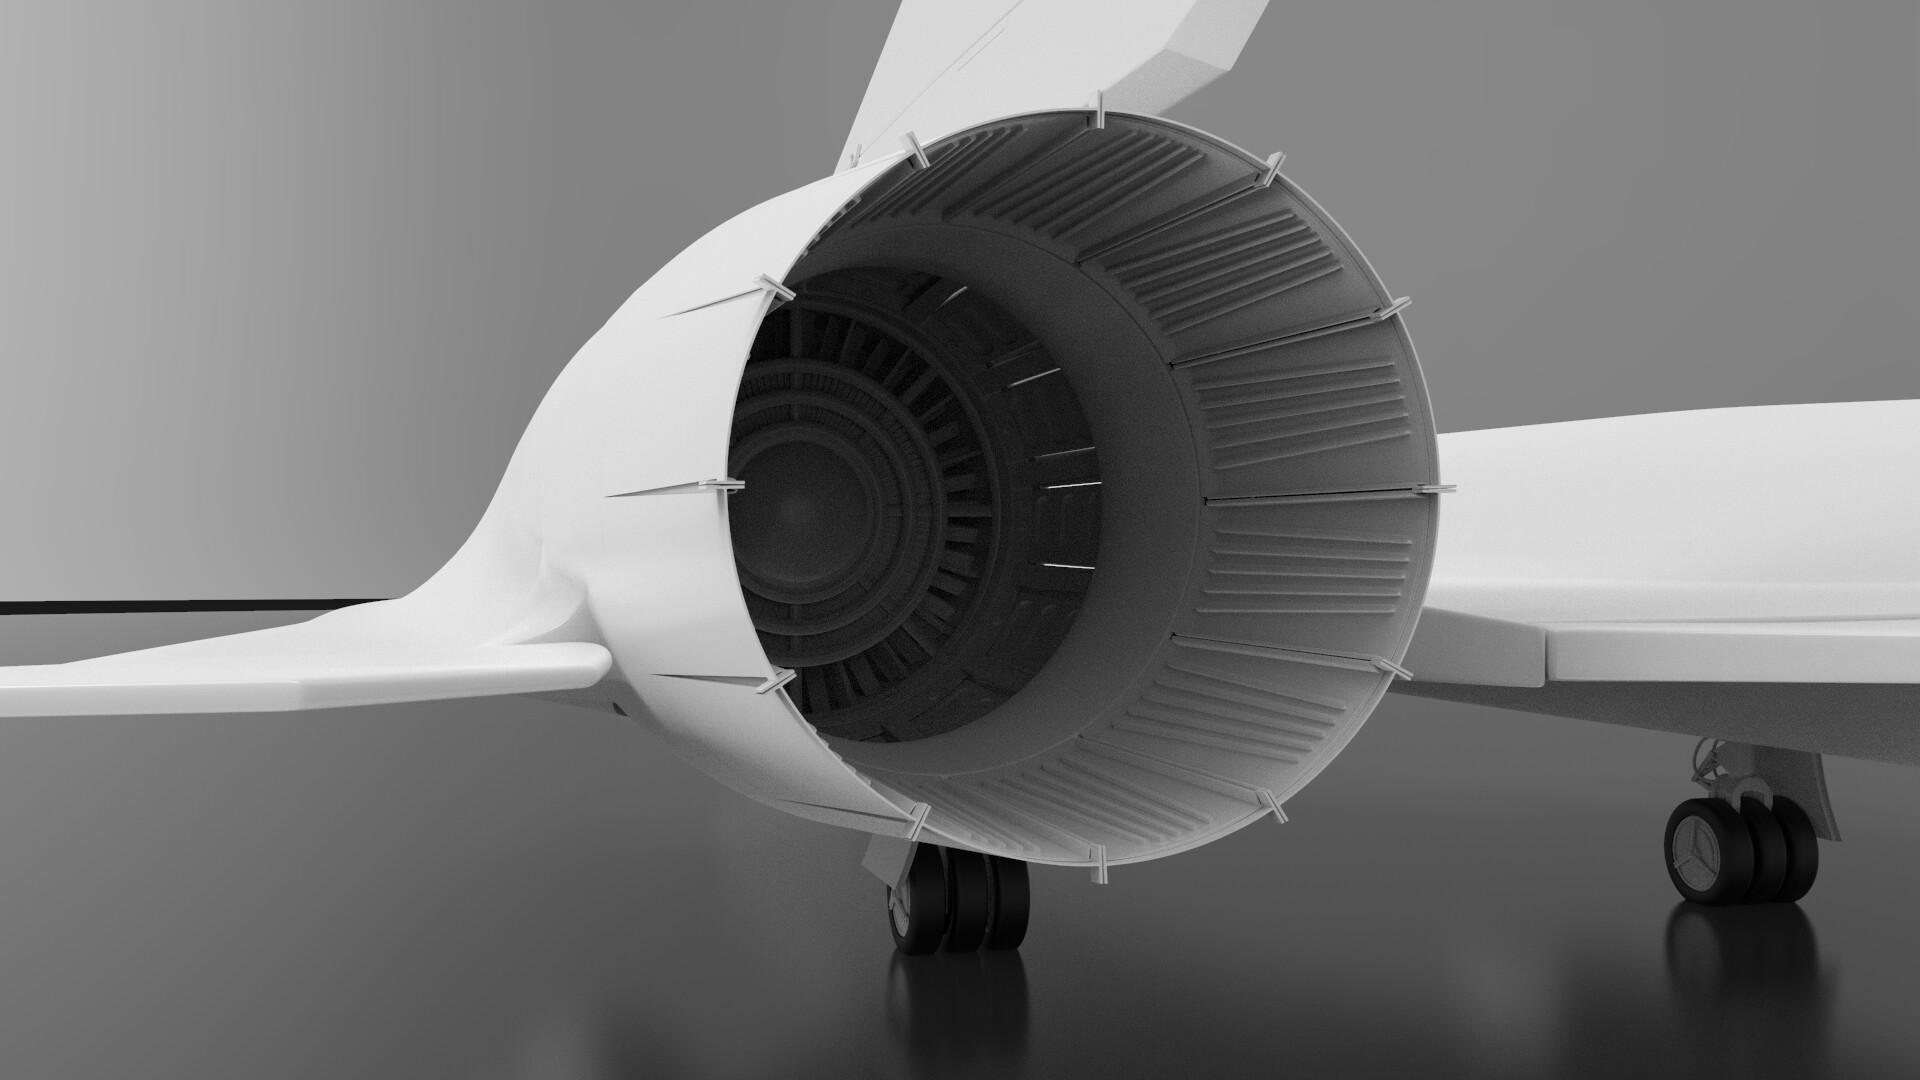 Jakub Mirola - Portfolio - SR-71 Blackbird model